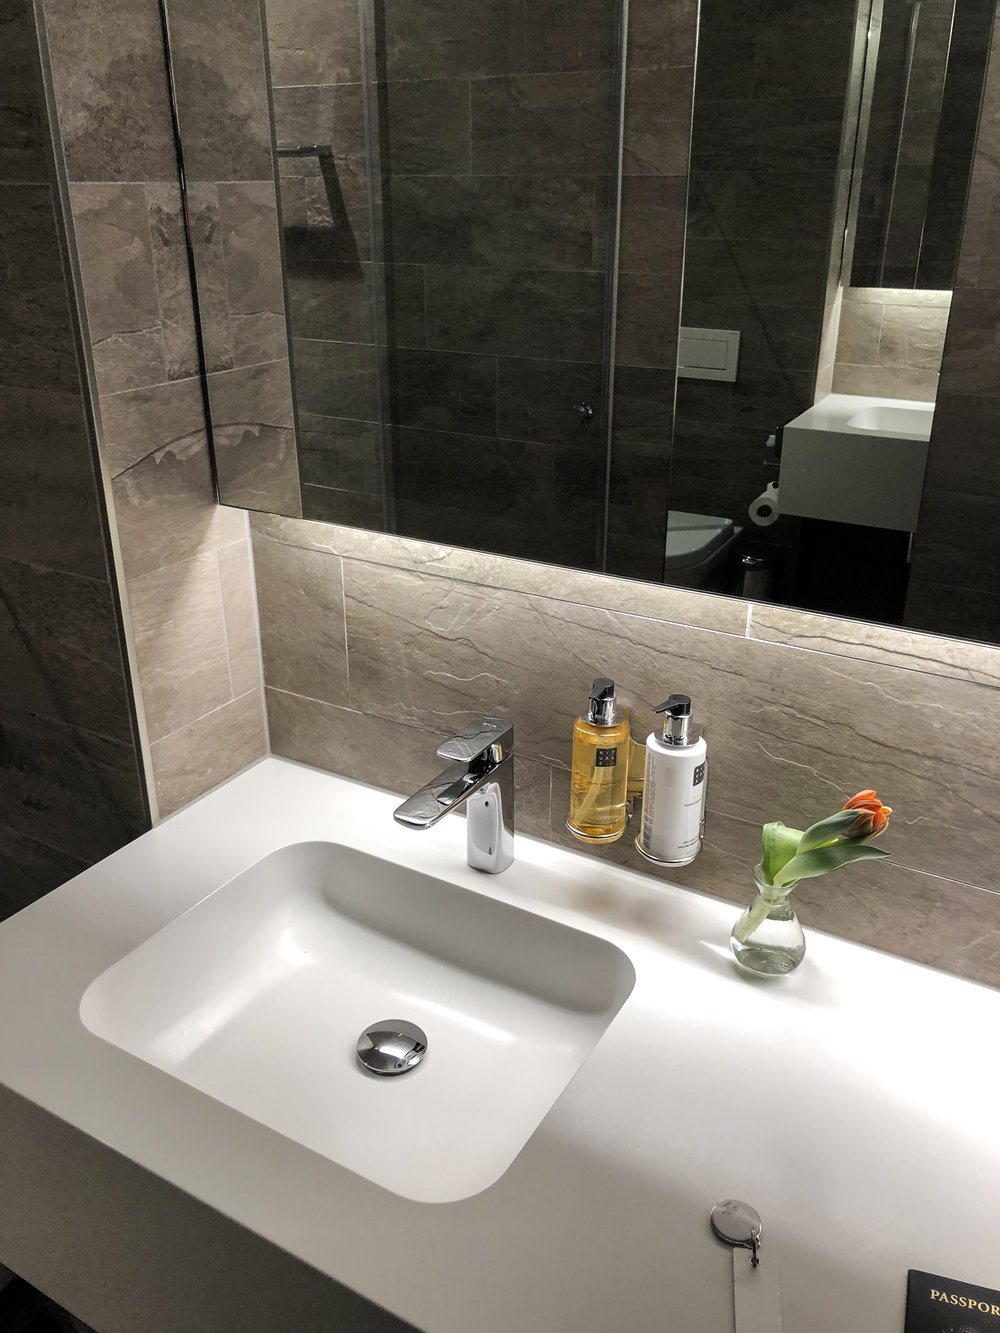 Swiss Business Class Lounge bathroom in Zurich